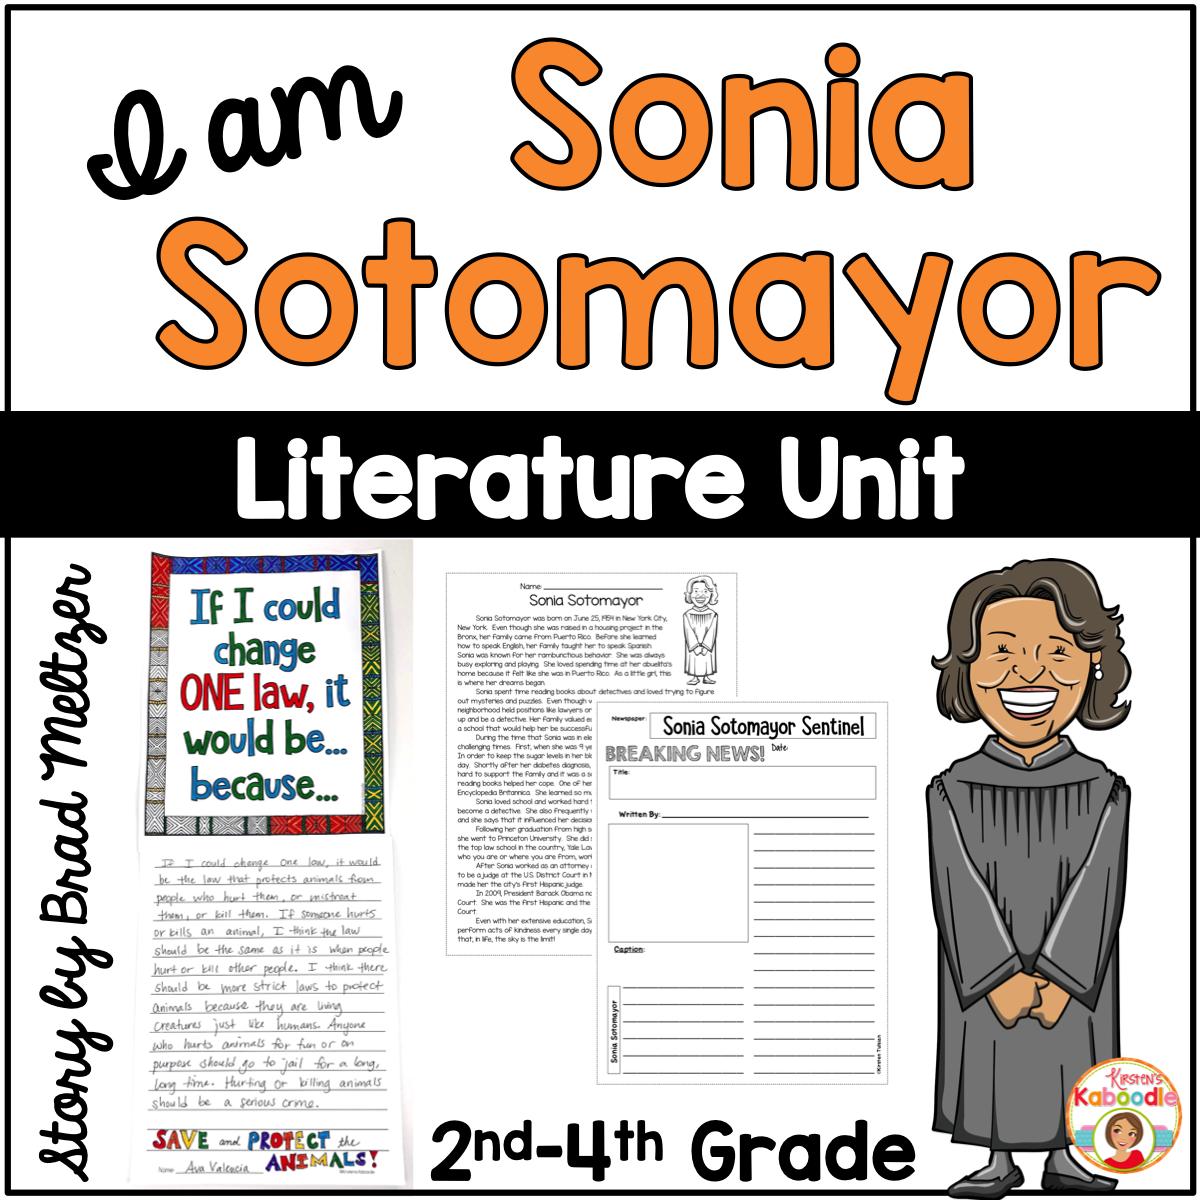 I am Sonia Sotomayor Activities